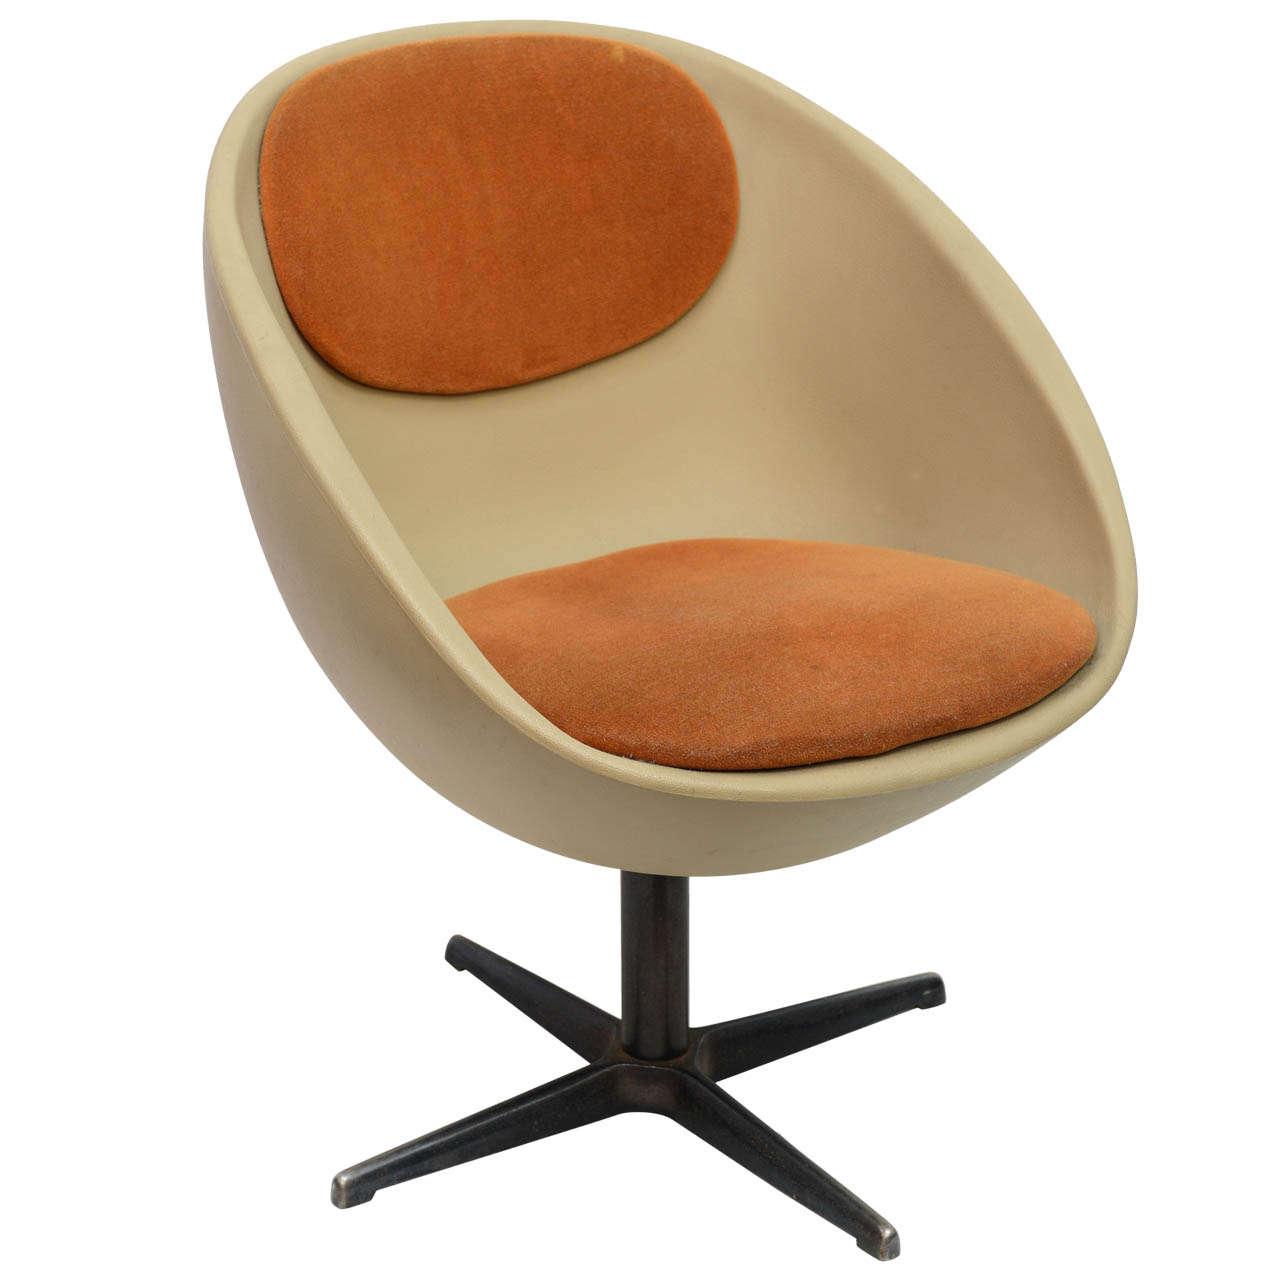 swivel chair mid century panasonic massage chairs 1960s ball/egg at 1stdibs